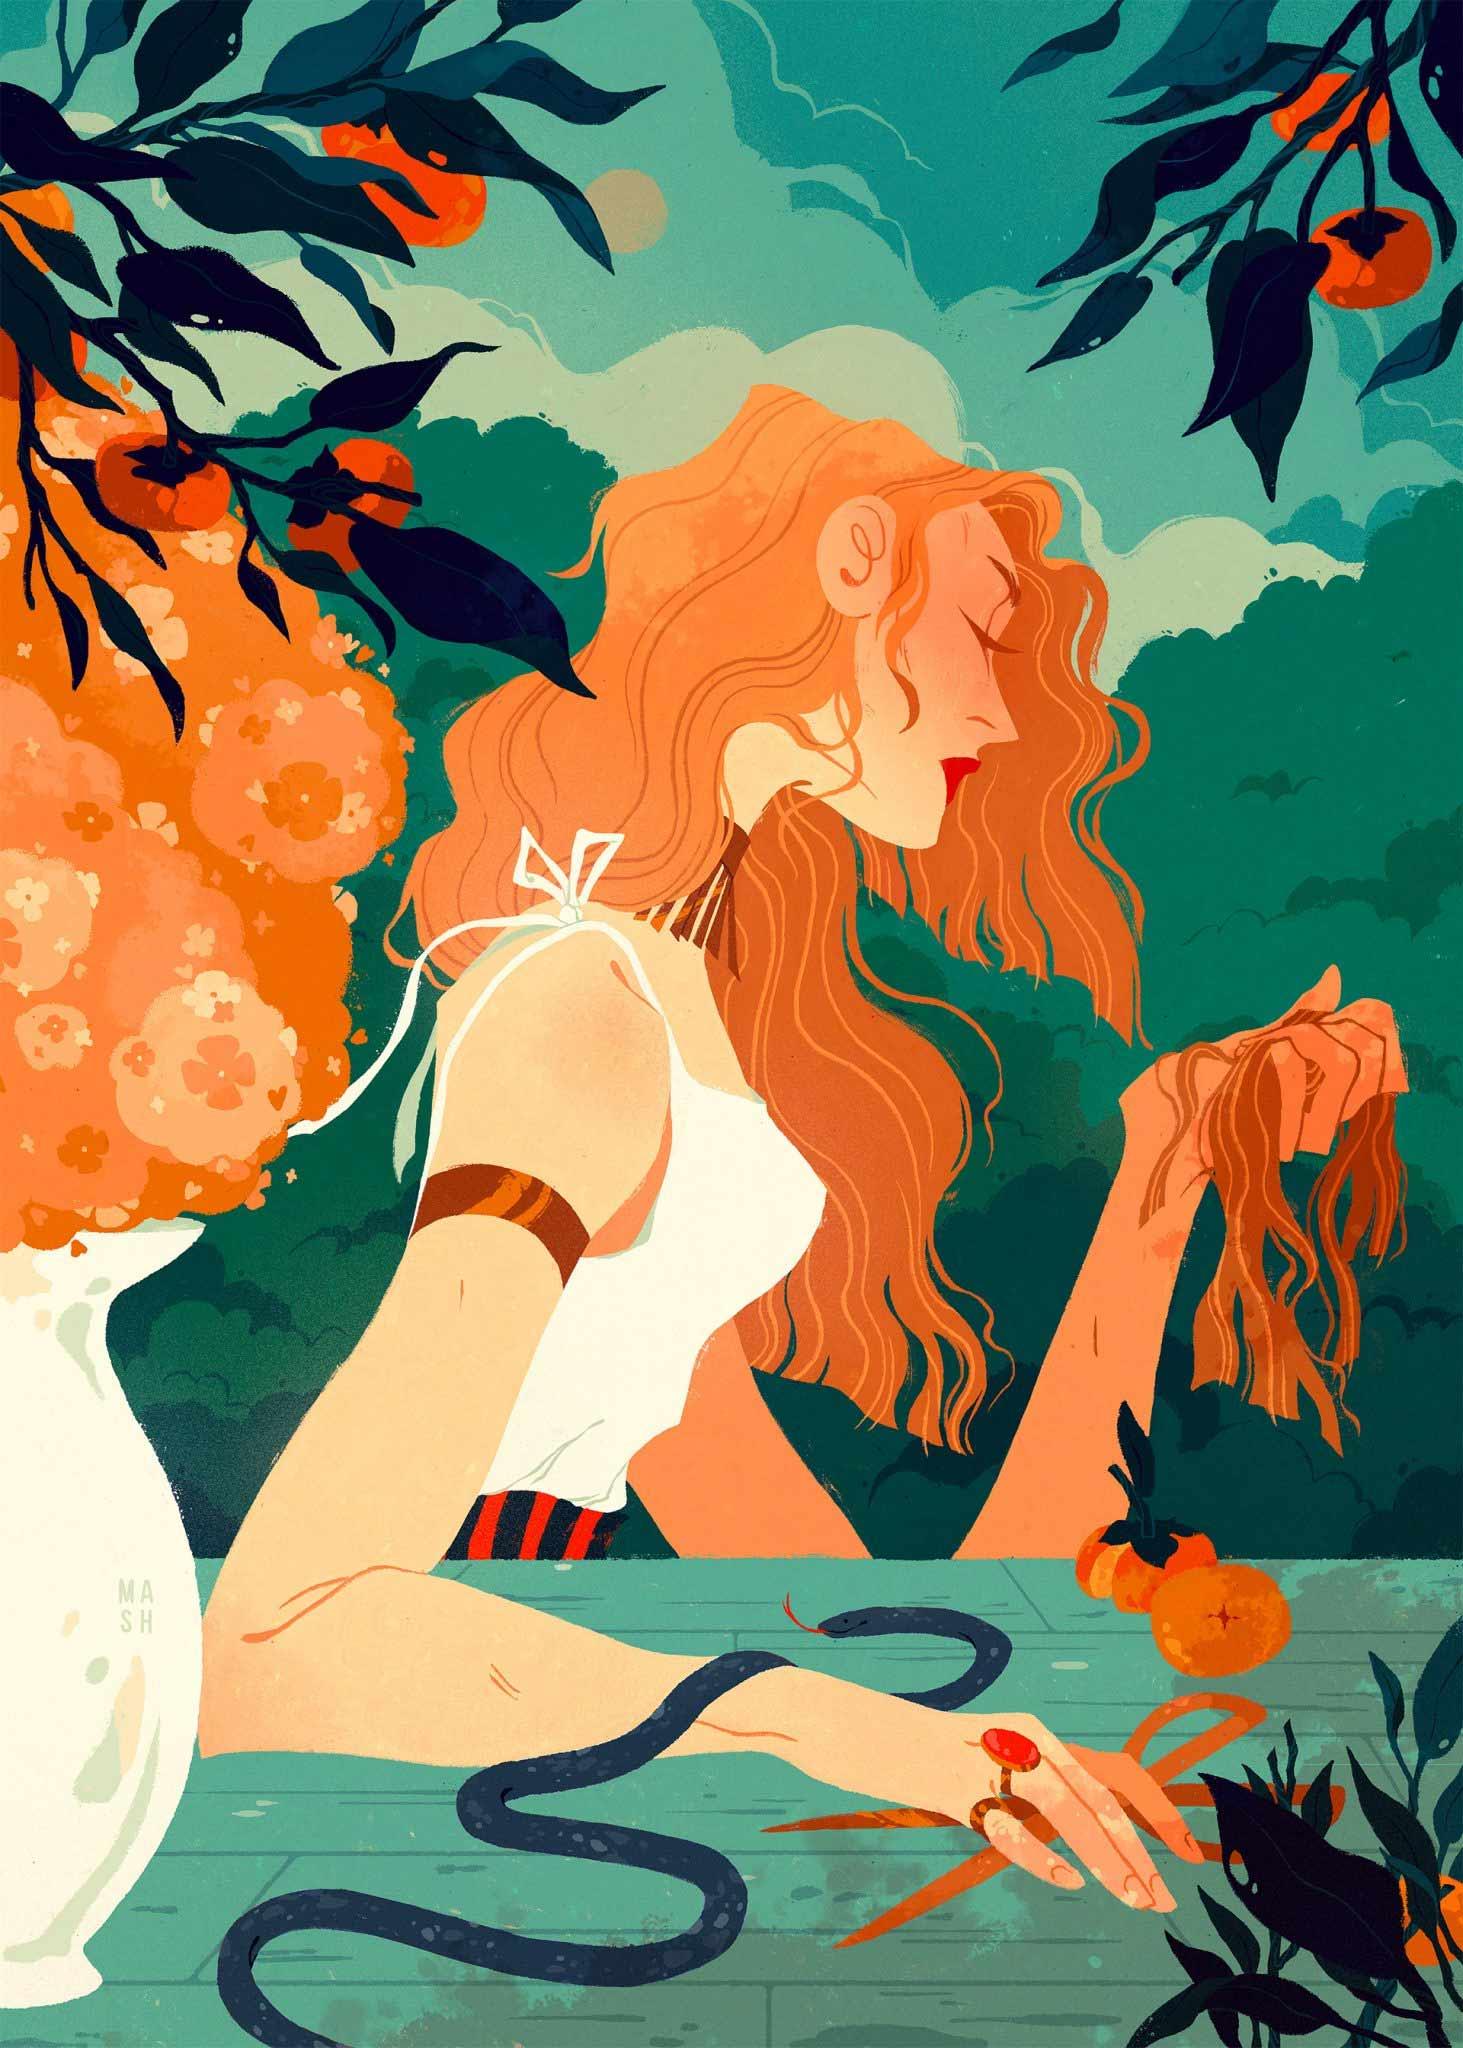 Illustrationen von Samantha Mash samantha-mash-illustrationen_03